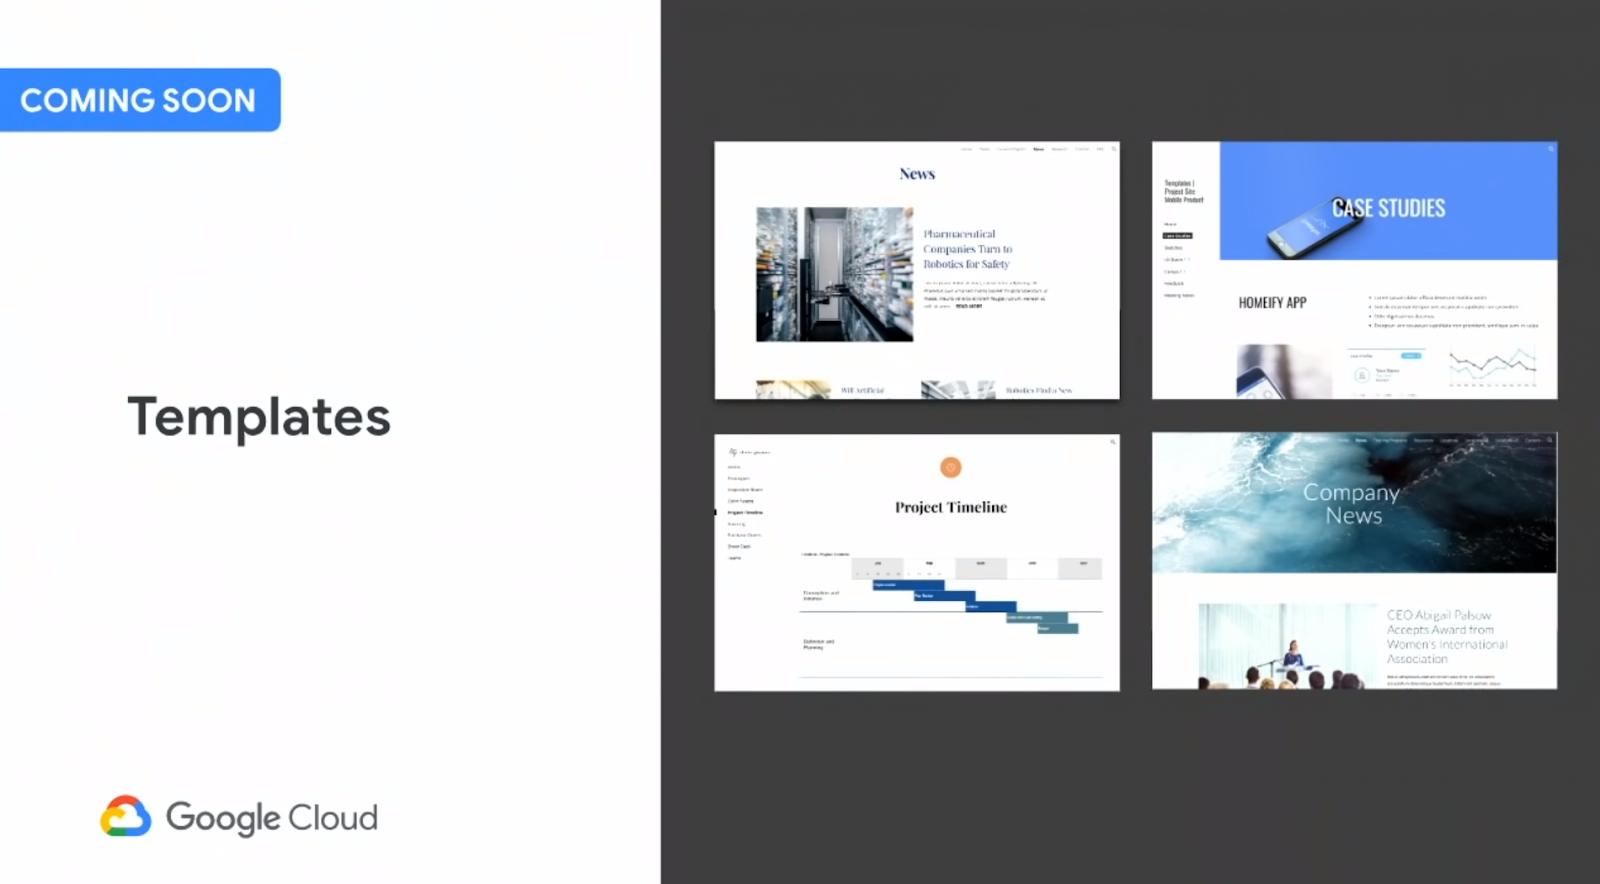 Web Design With Google Sites